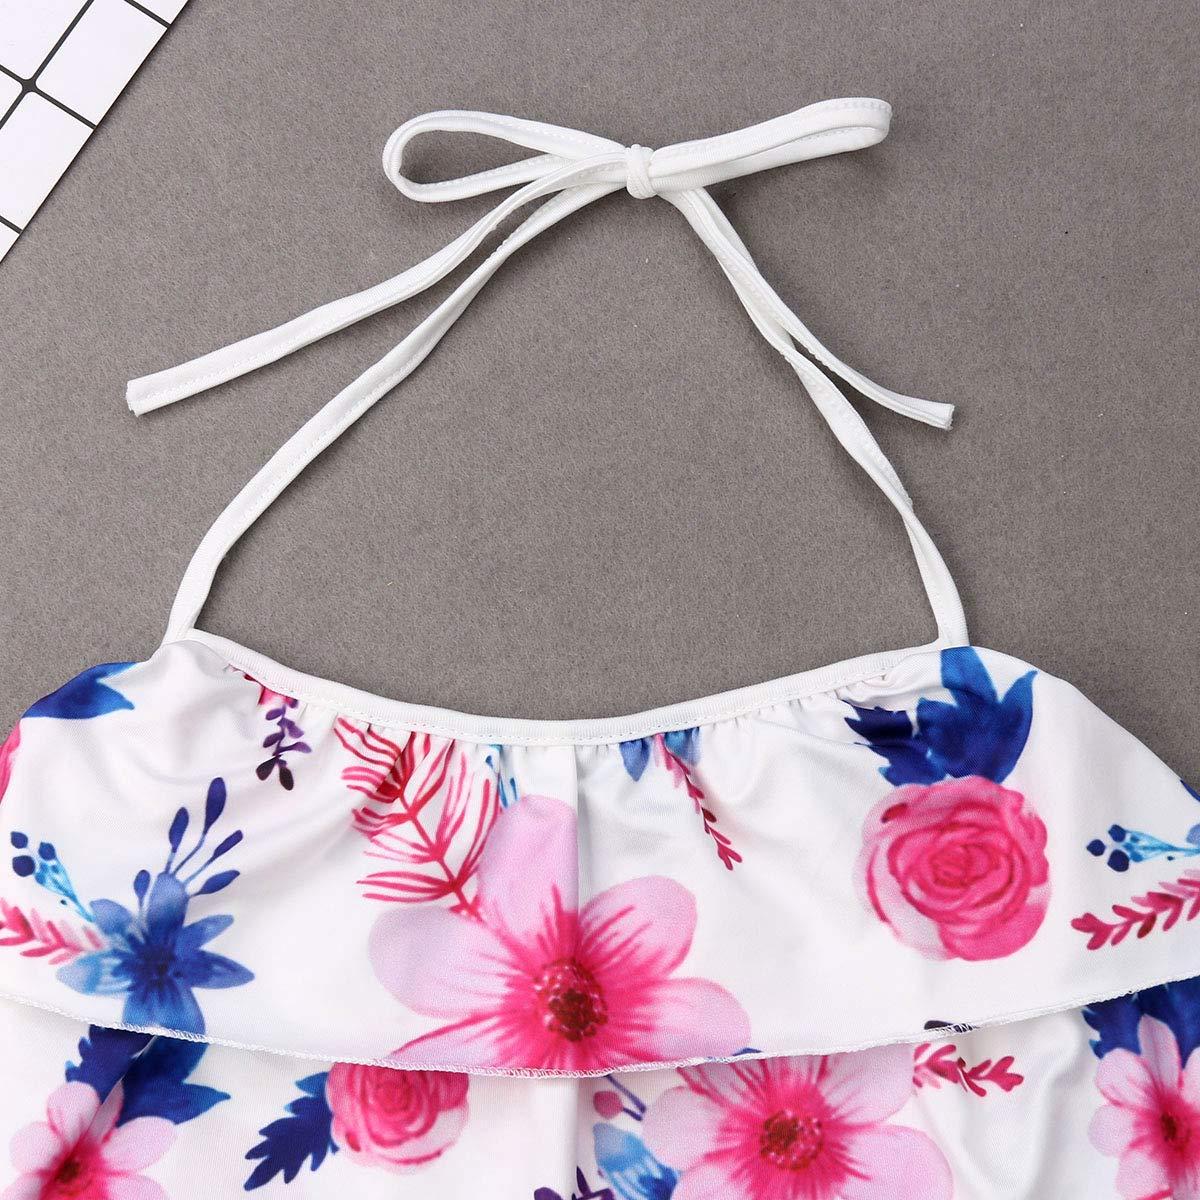 Family Matching Mom and Me Floral Print Bikini Cute Ruffle Halter Beachwear Bathing Suit Swimwear